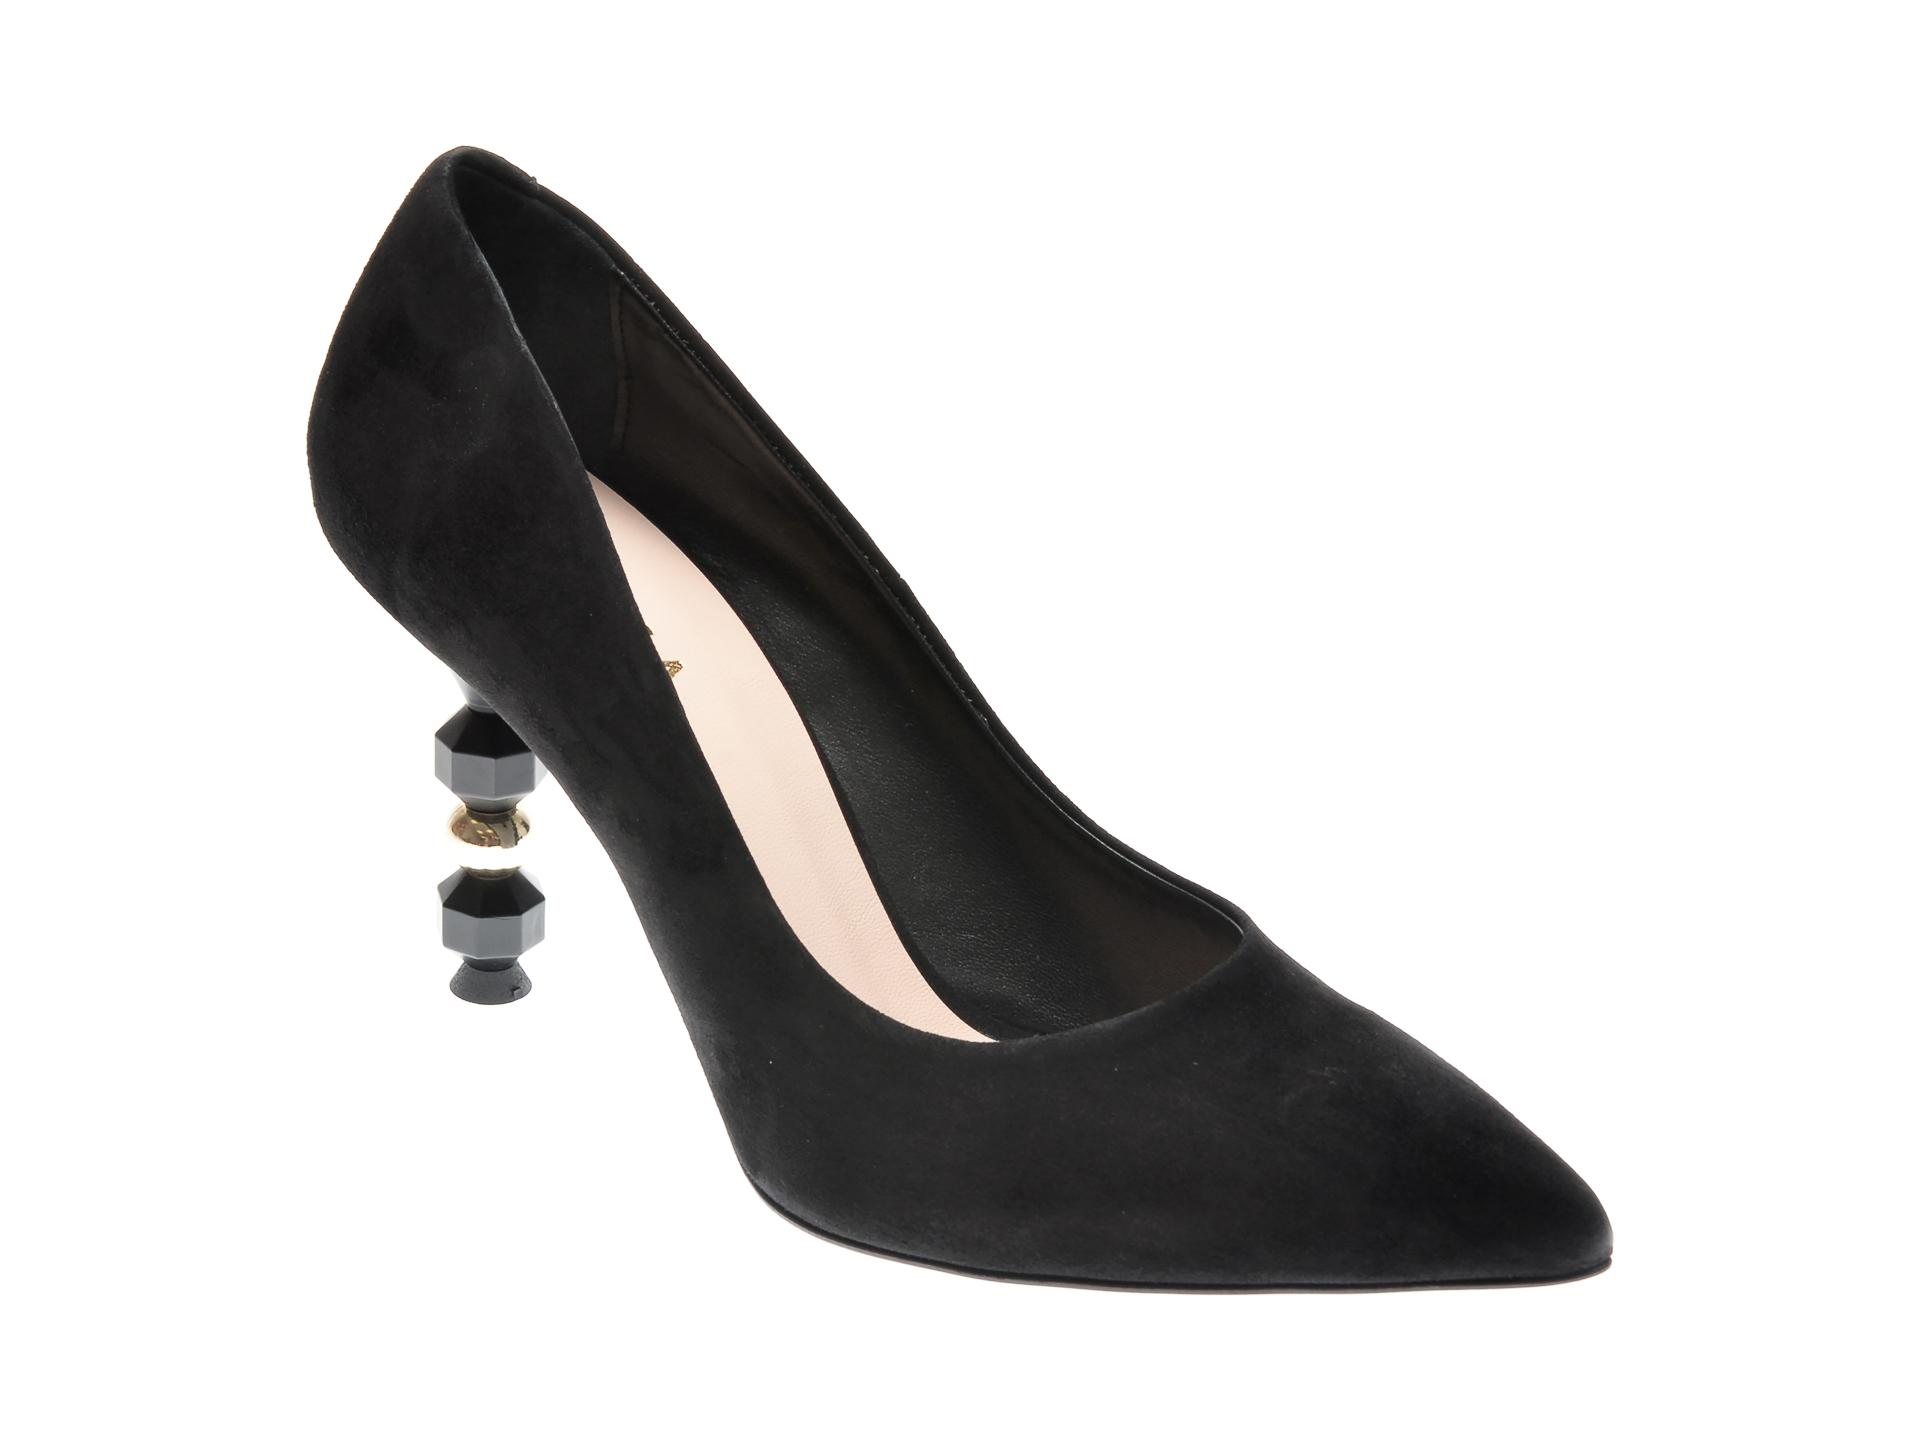 Pantofi EPICA negri, 4217, din piele intoarsa